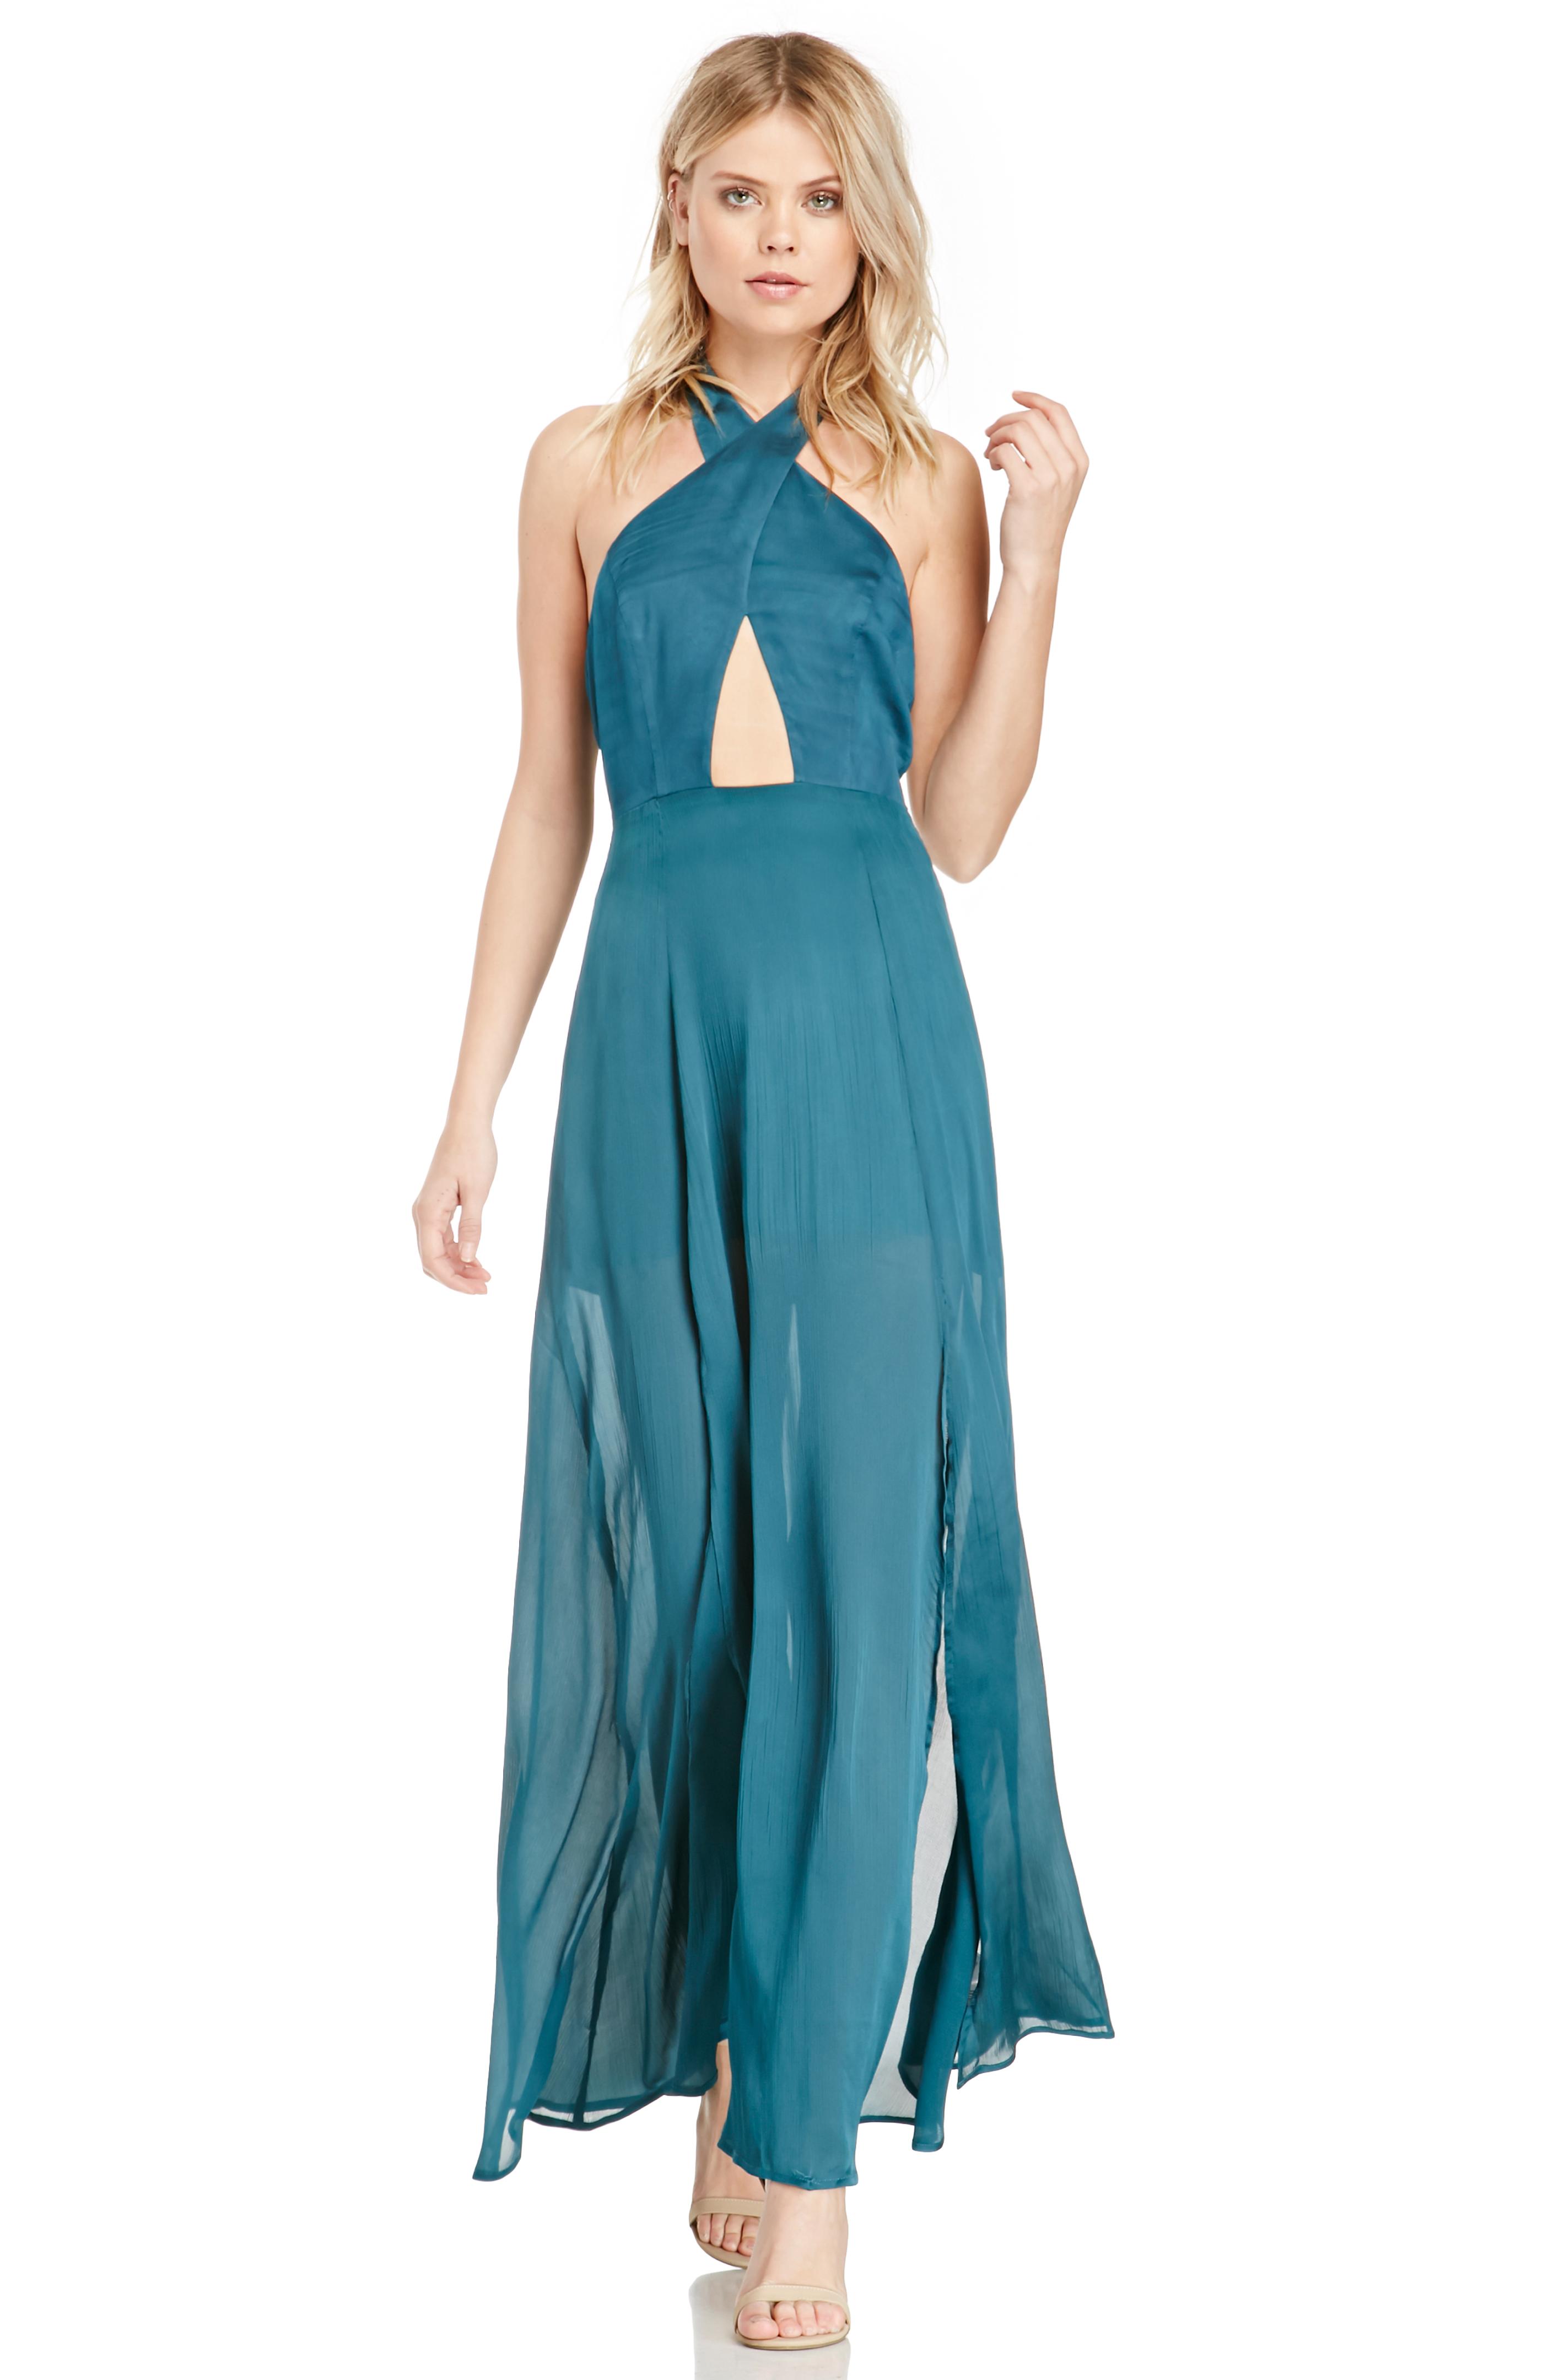 STYLESTALKER Queen Of The Night Maxi Dress in Teal | DAILYLOOK